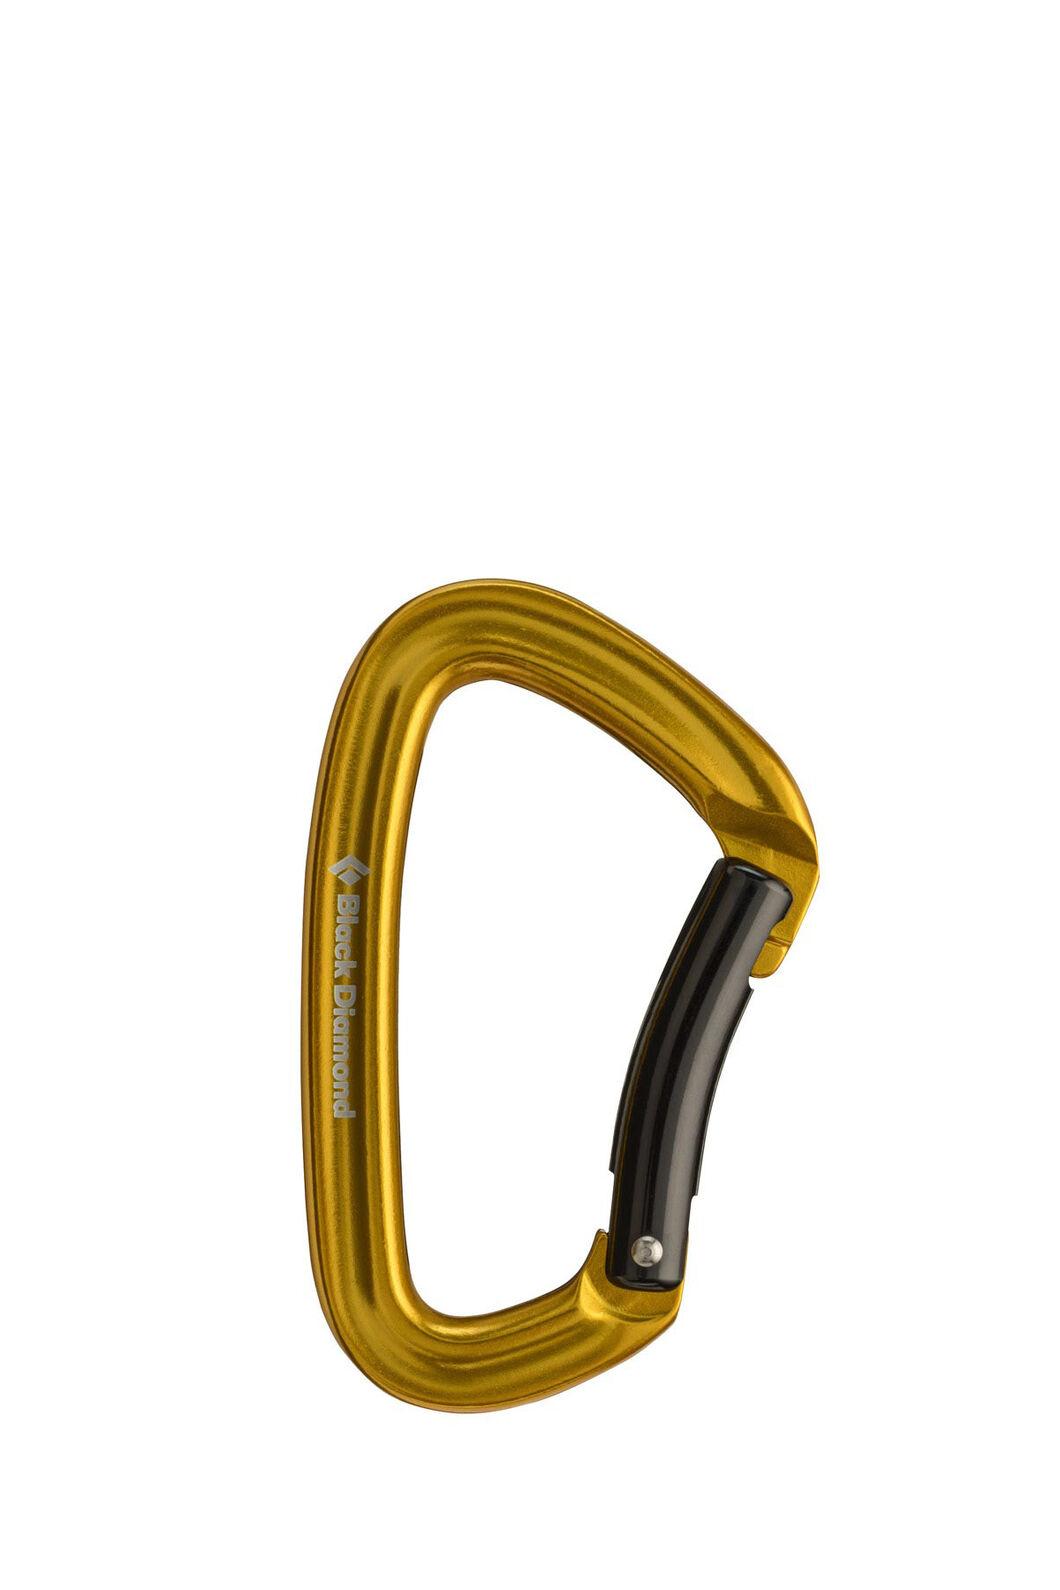 Black Diamond Positron Bent Gate Carabiner, Yellow, hi-res